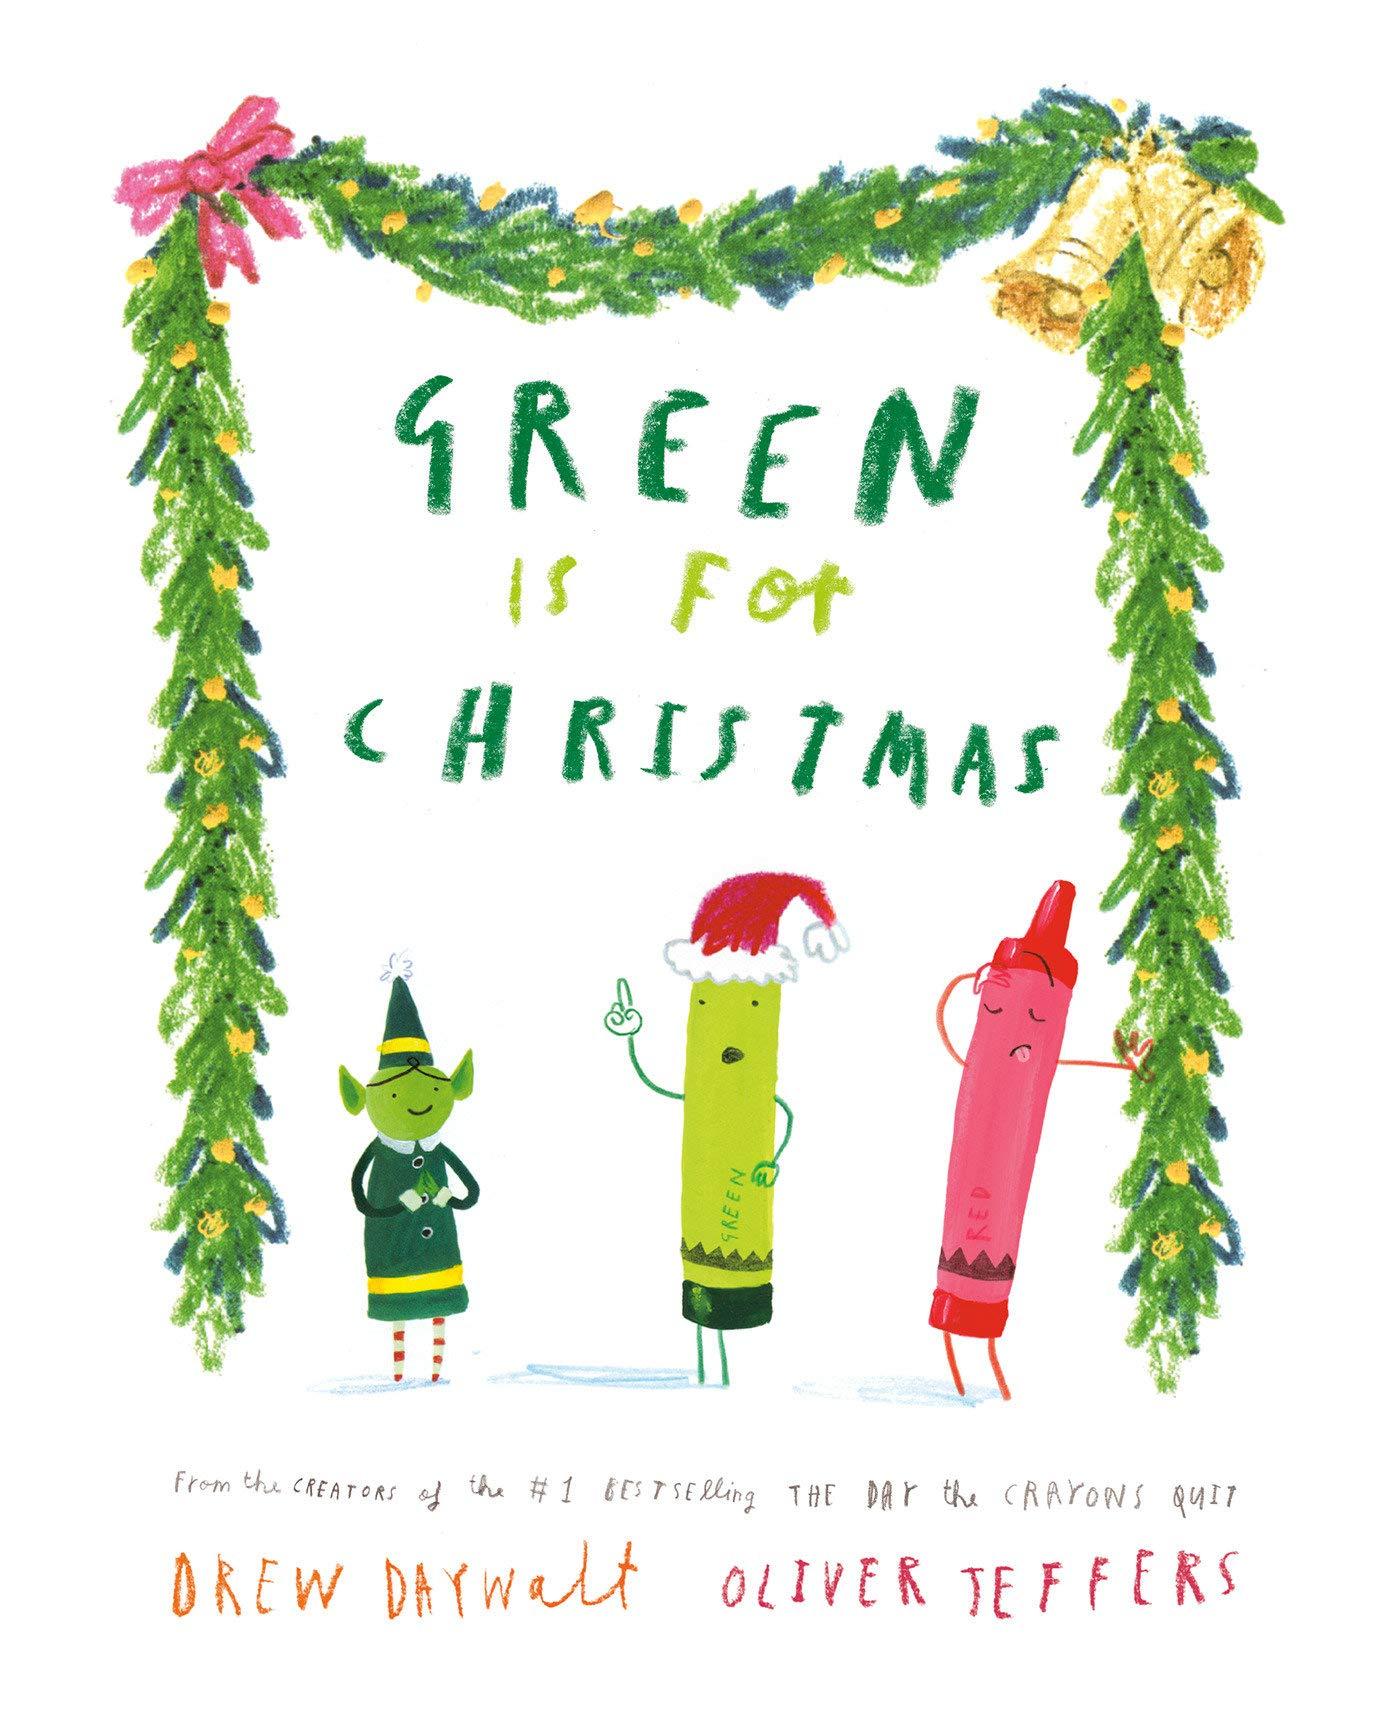 Jeffers Christmas 2021 Green Is For Christmas Daywalt Drew Jeffers Oliver 9780593353387 Amazon Com Books